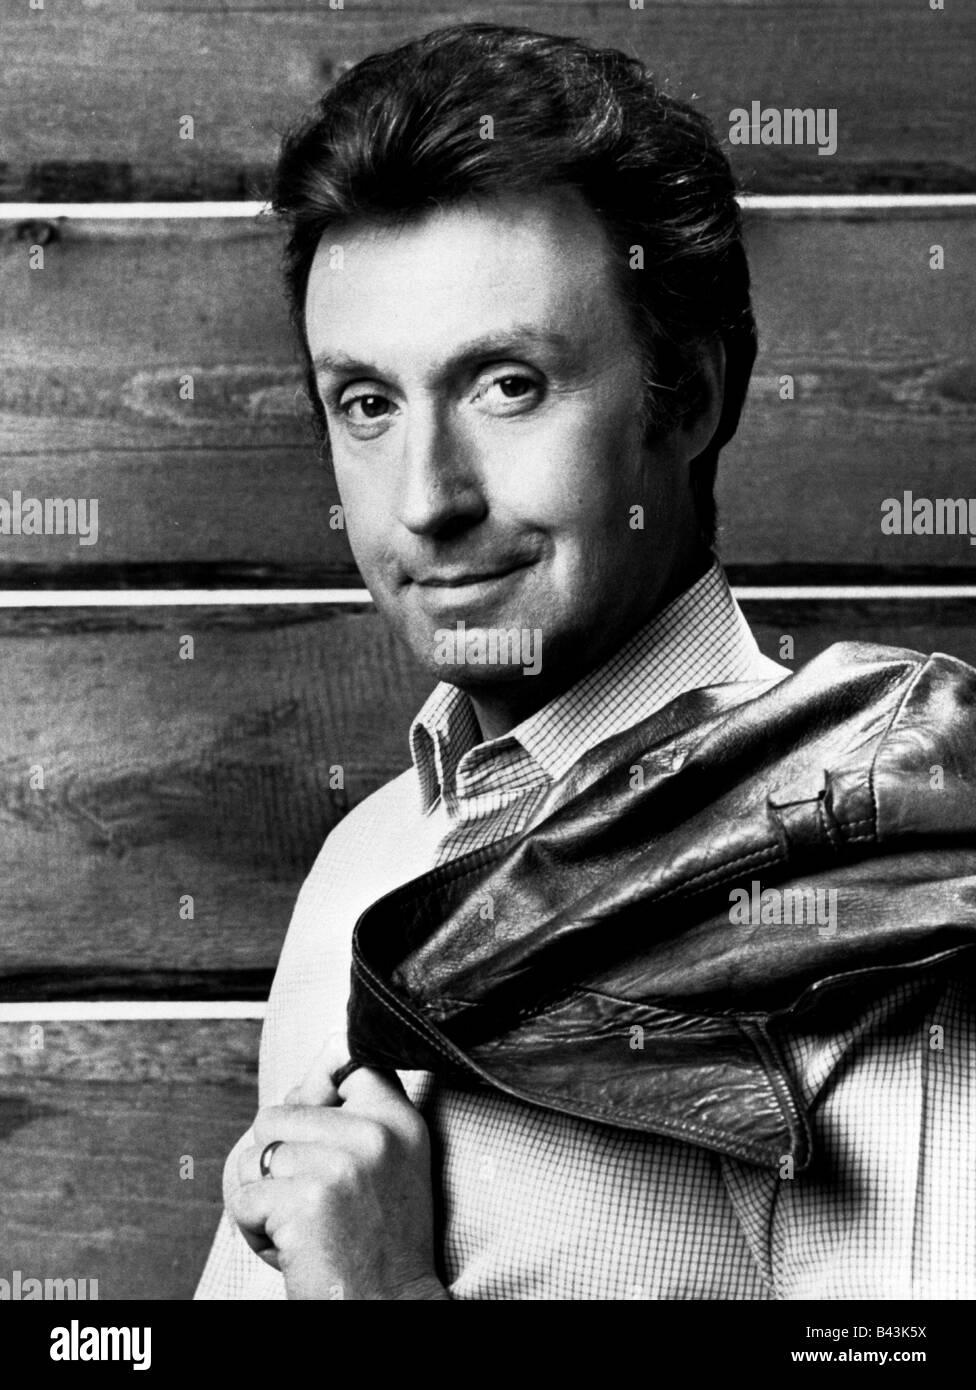 Alexander, Peter, 30.6.1926 - 12.2.2011, Austrian musician, singer and actor, pr photo, gala concert, Westfalenhalle, - Stock Image